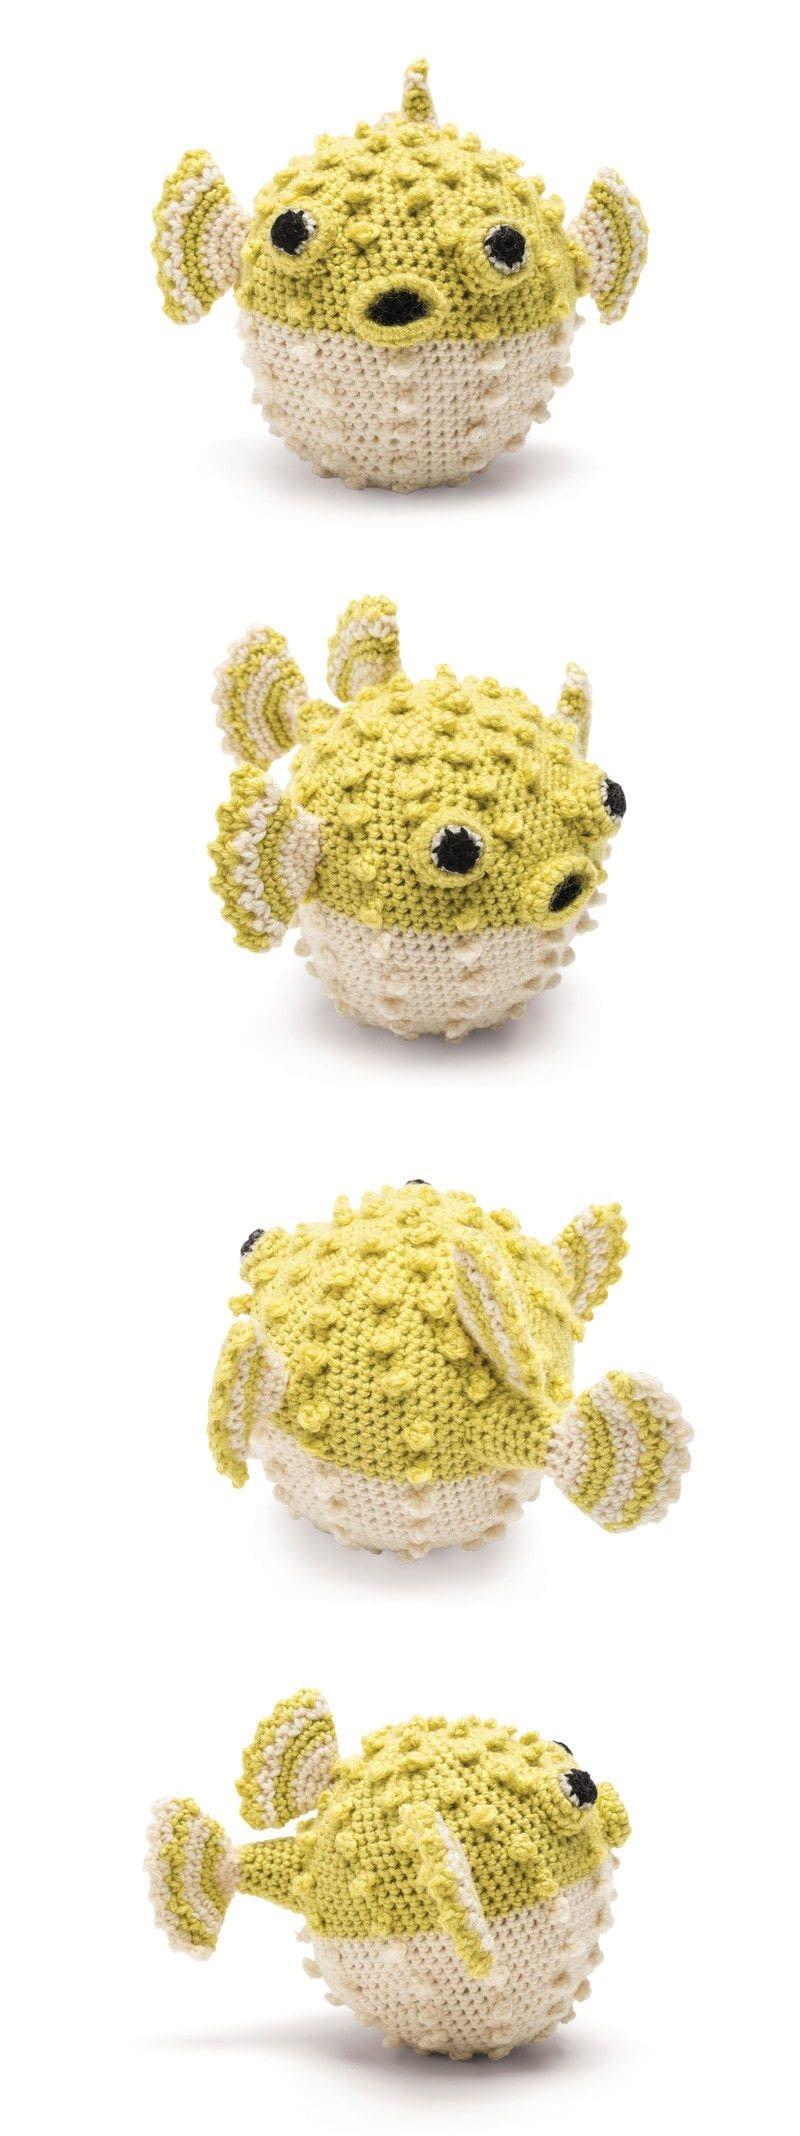 Puffer Fish All Free Amigurumi Pinterest Crochet Crochet